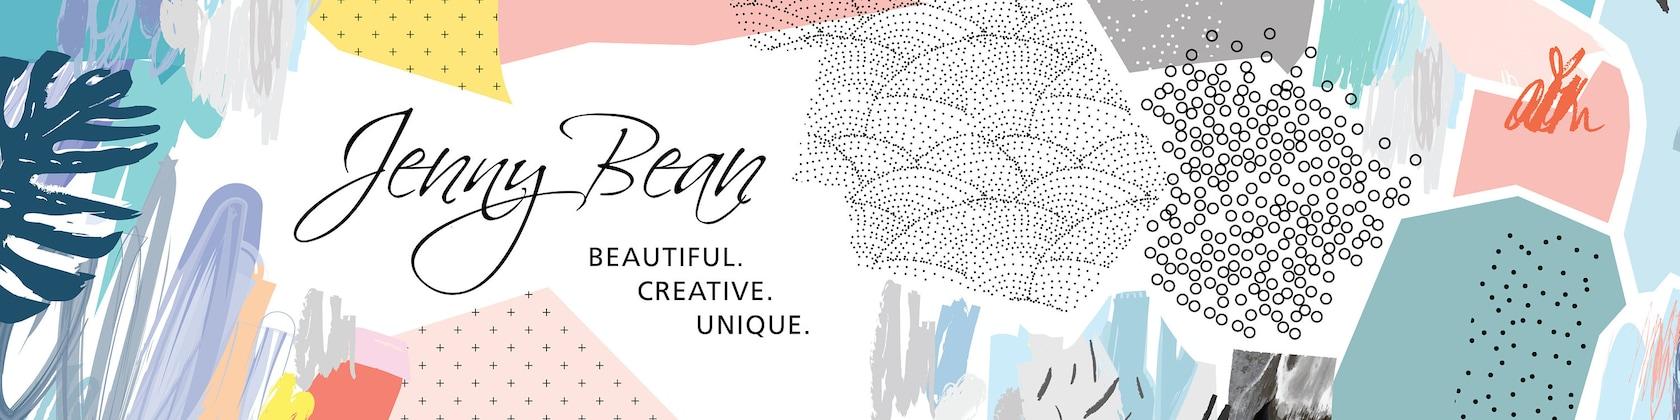 Jenny Bean Boutique von JennyBeanCandles auf Etsy